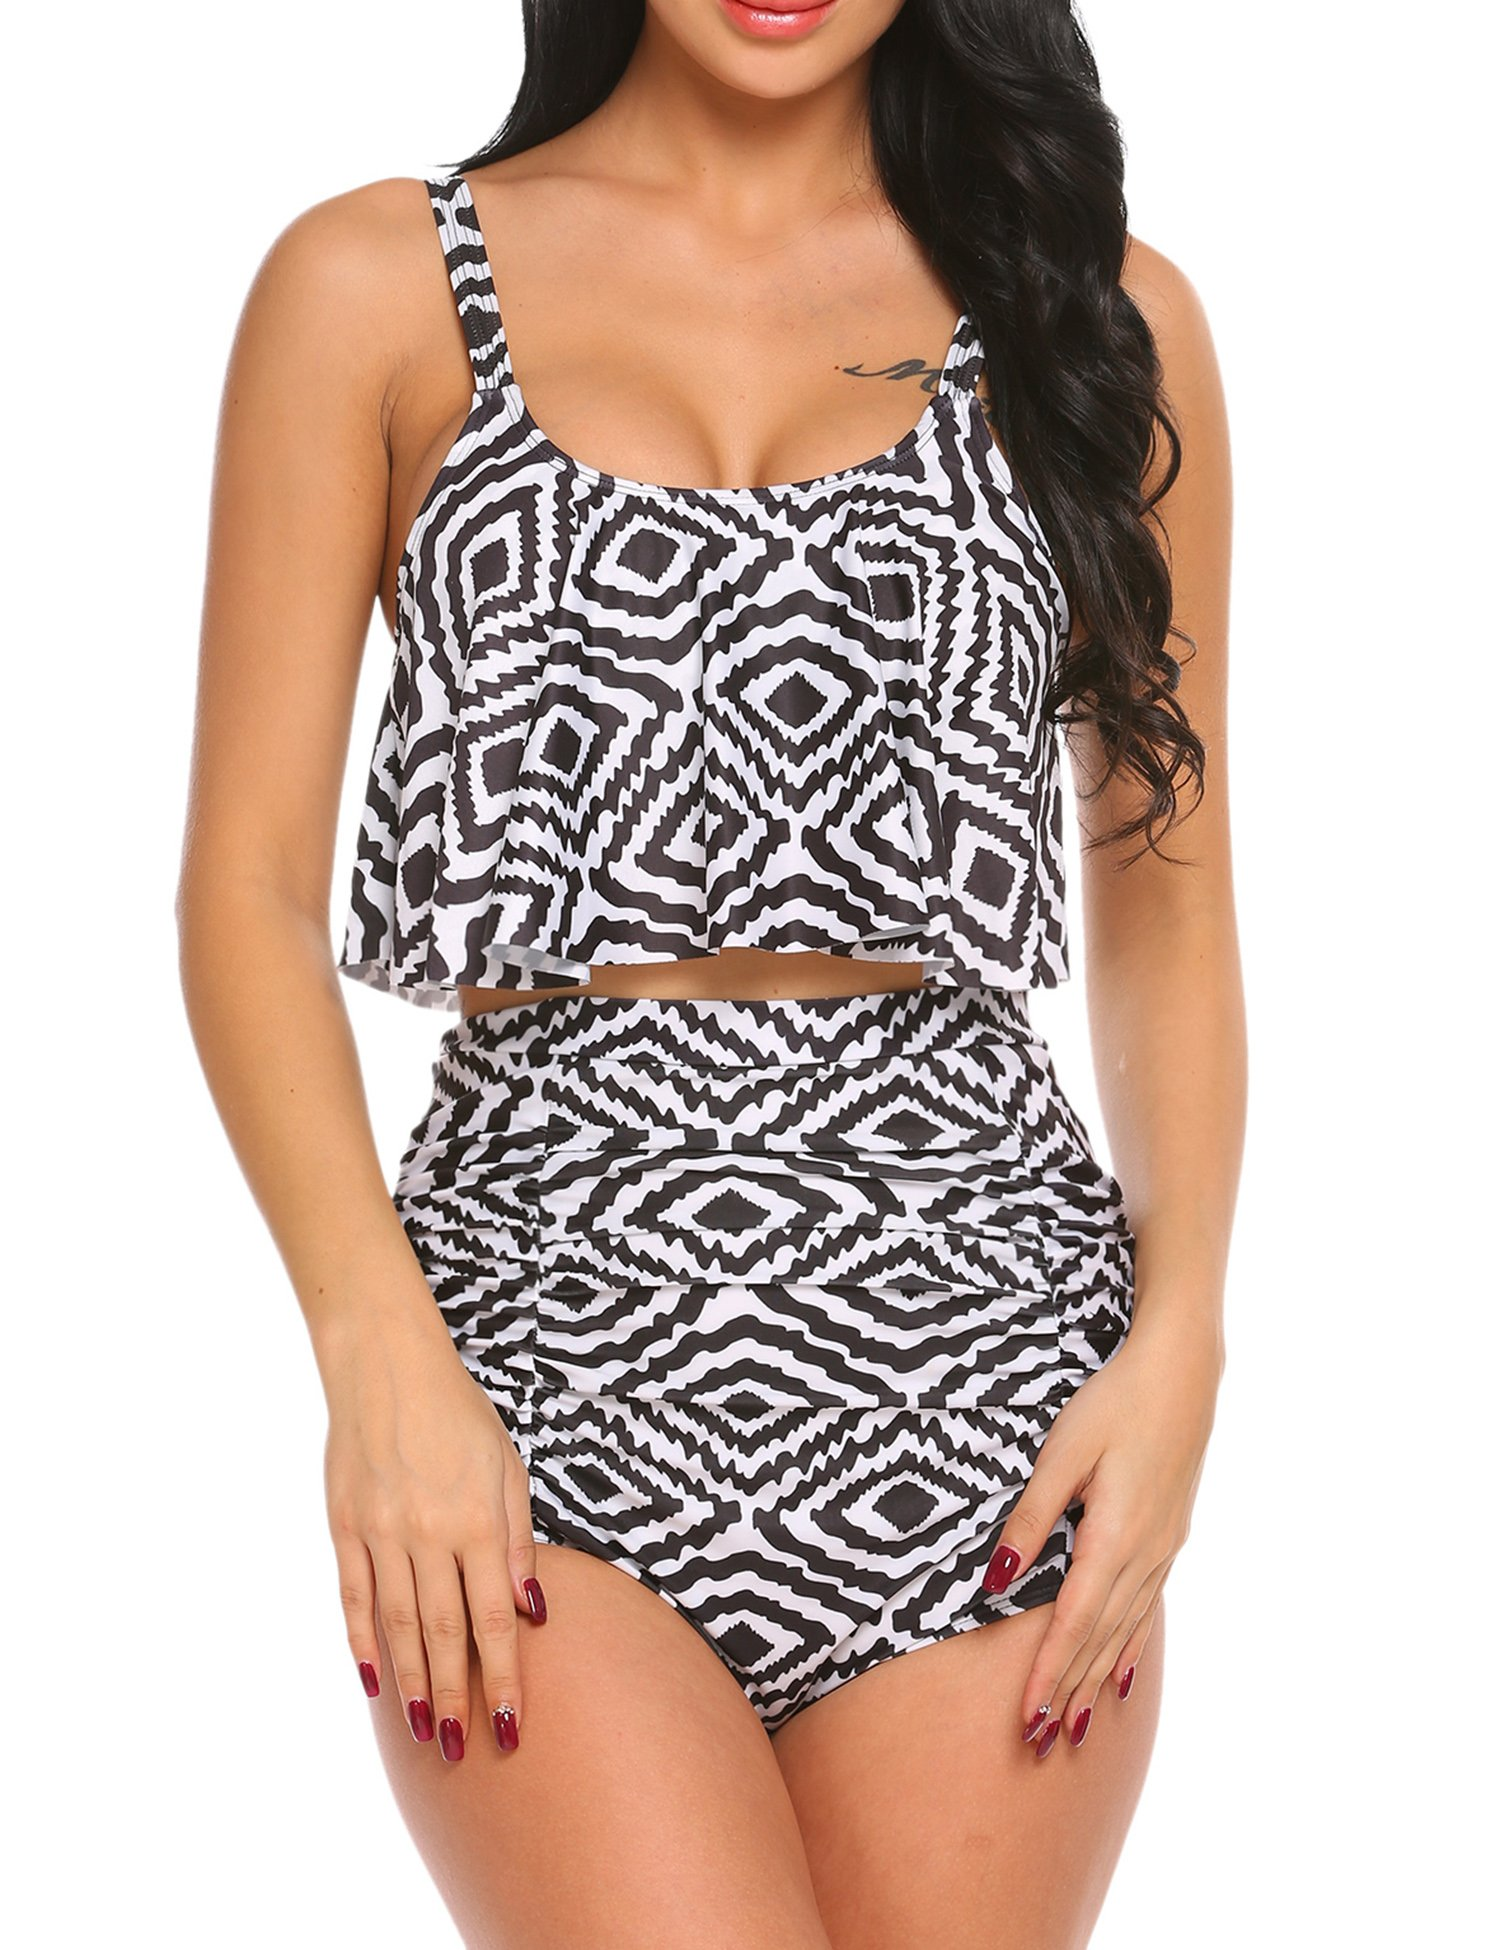 dce30d0cc96 ADOME Tummy Control Swimsuits for Women Ruffled High Waisted Bikini Set  Floral Printed Plus Size Swimwear